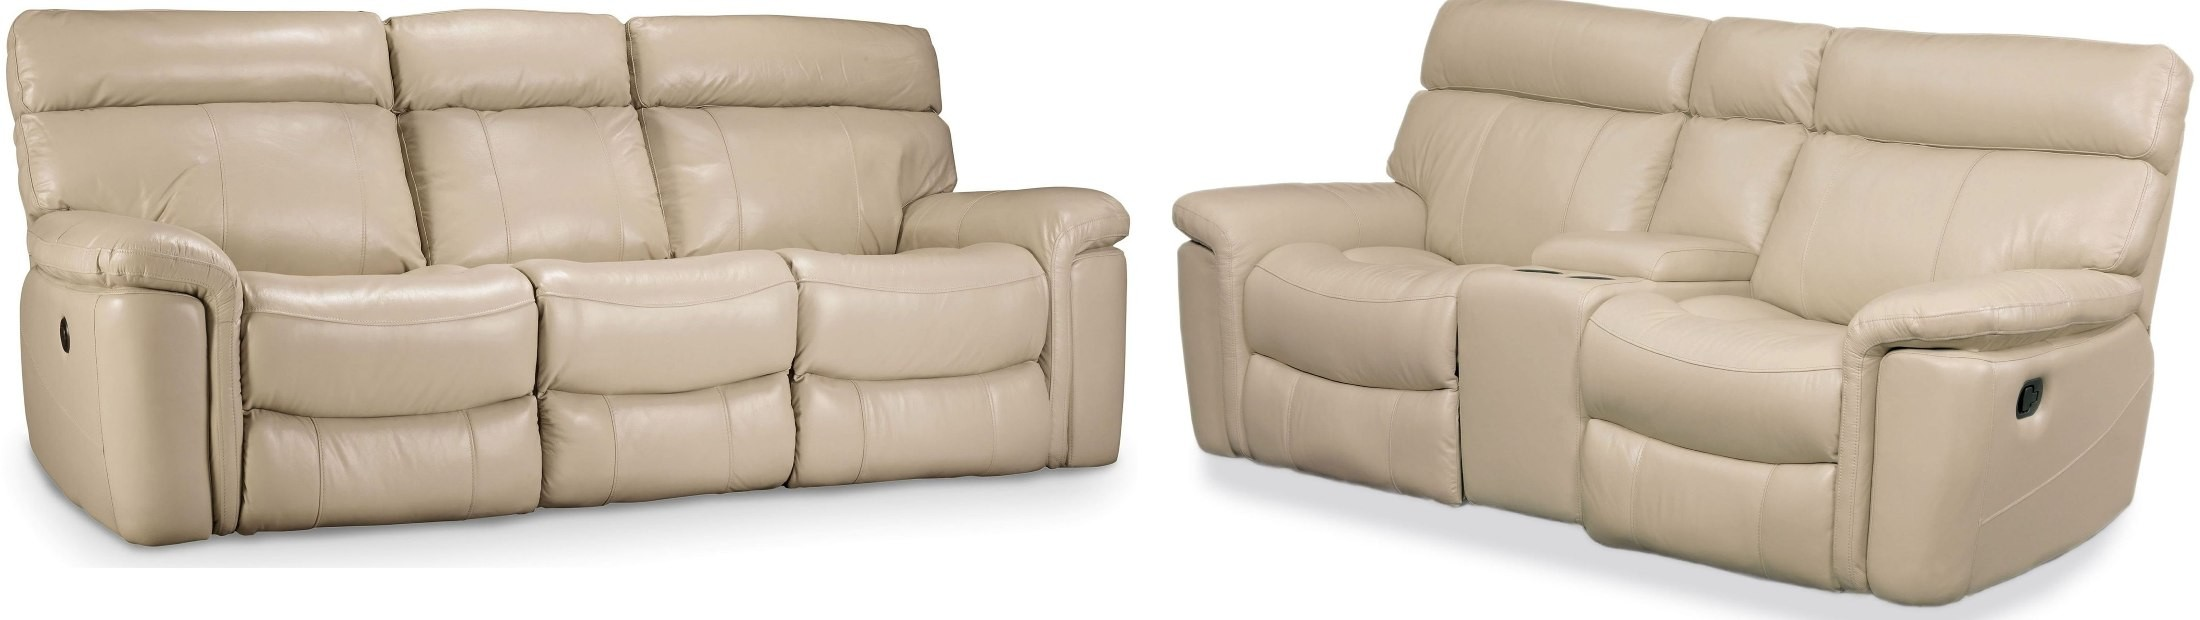 Melanie Beige Leather Reclining Living Room Set Ss620 03